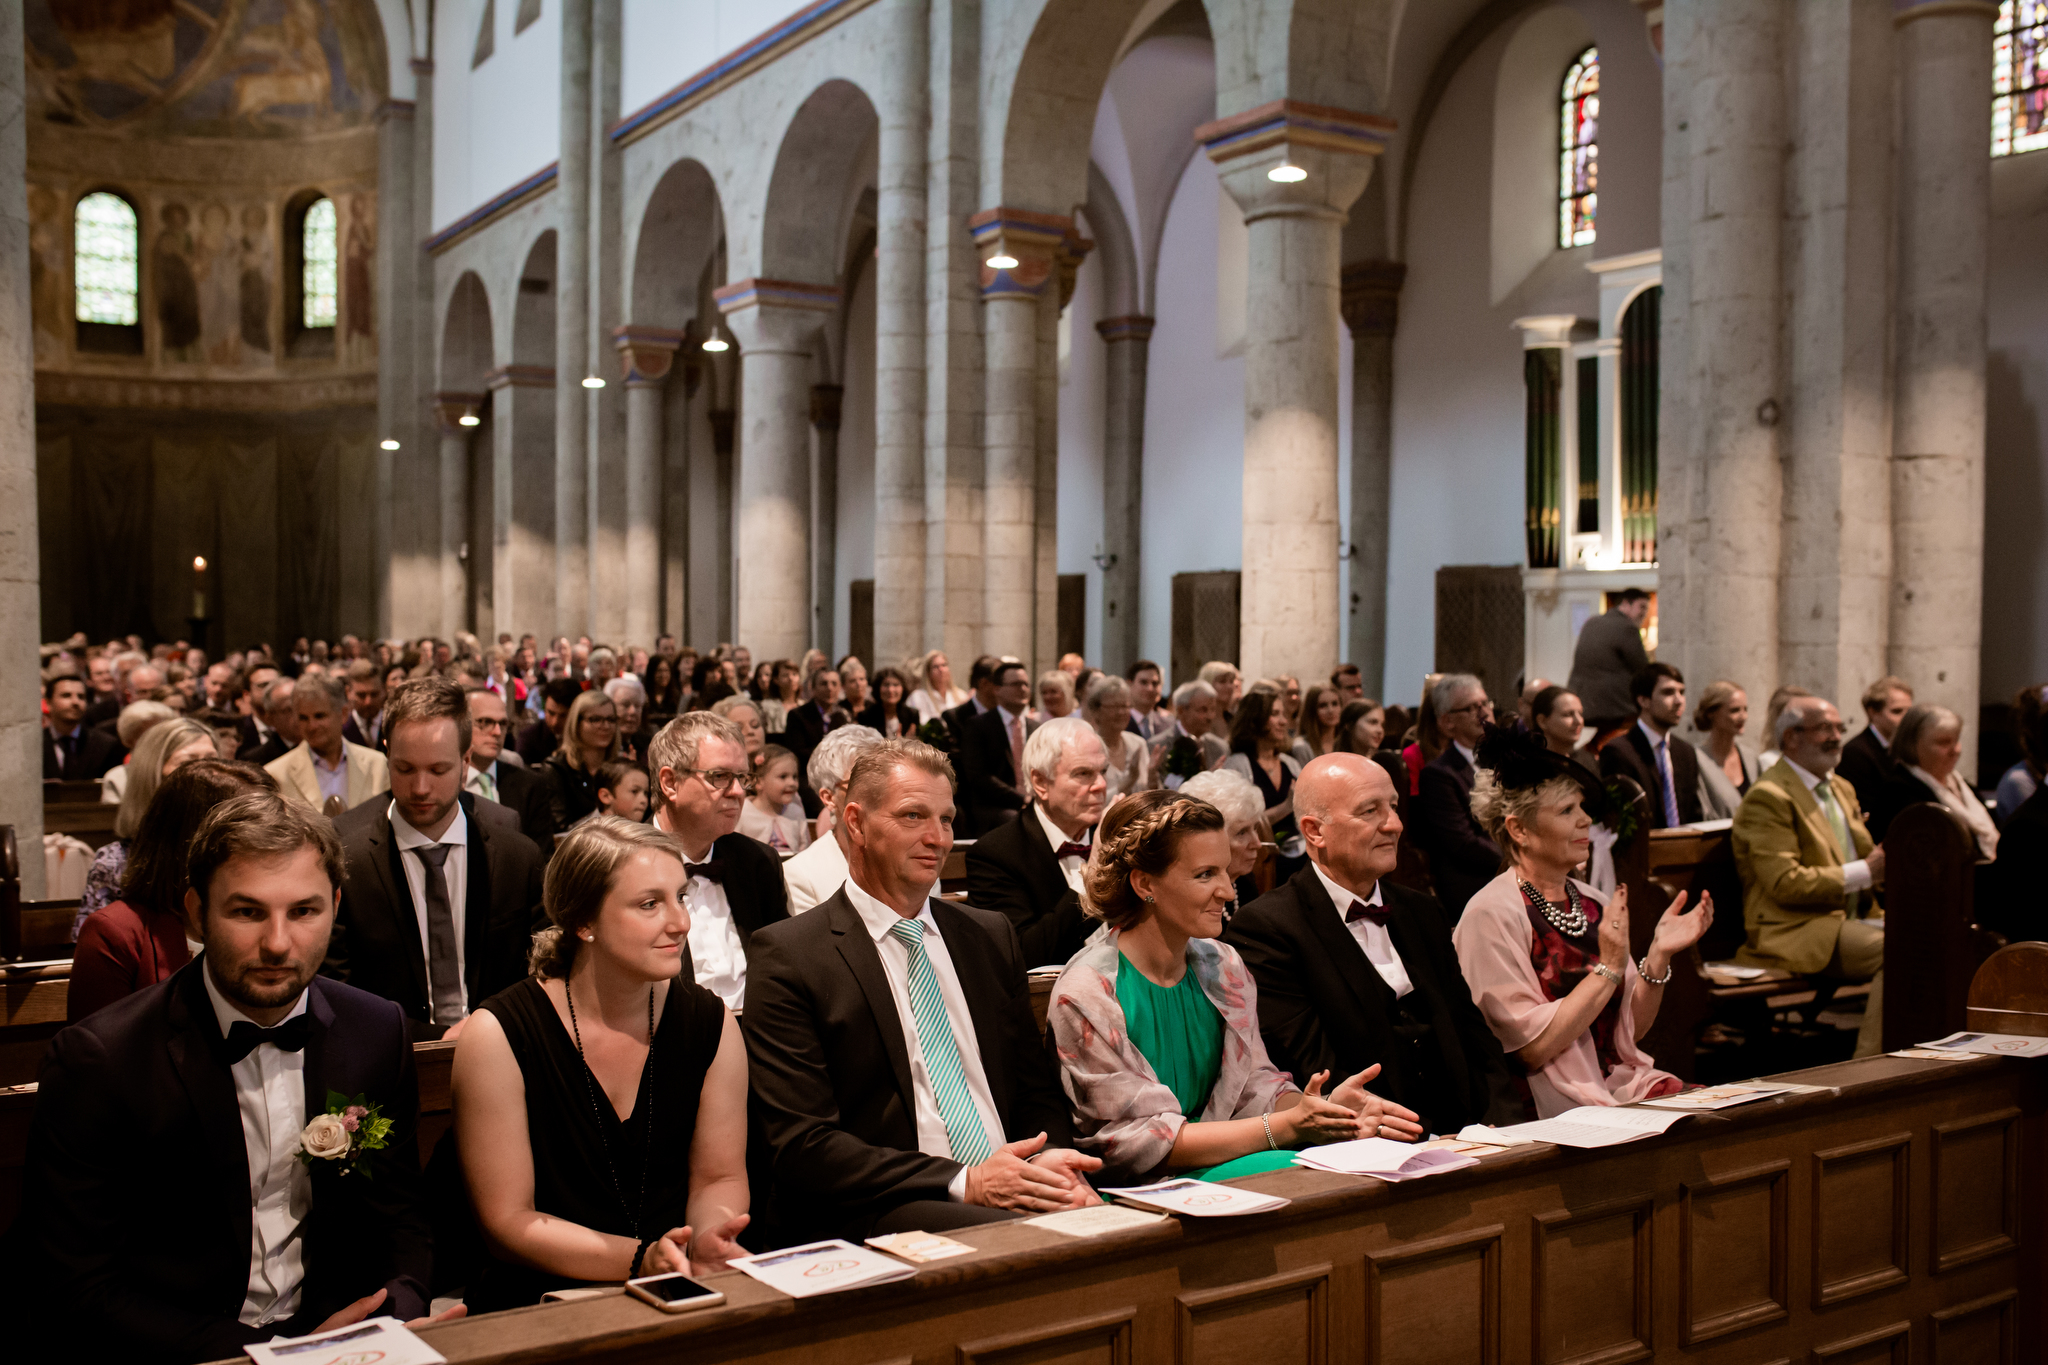 Claudia Krawinkel Fotografie Hochzeitsfotograf Essen Düsseldorf Dormagen Kloster Knechtsteden Hochzeitsreportage Hochzeit Knechtsteden60